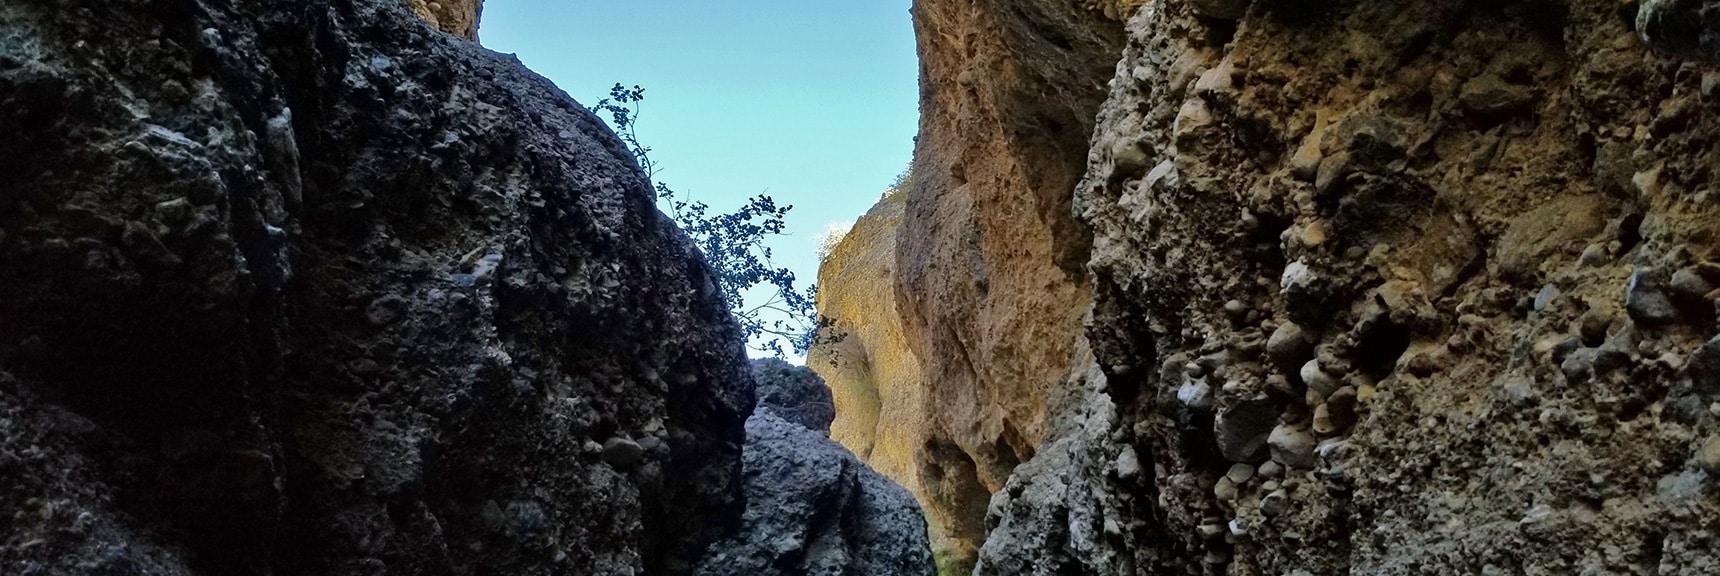 Blue Sky Seen Above the Slot Canyon | Harris Springs Canyon | Biking from Centennial Hills | Spring Mountains, Nevada